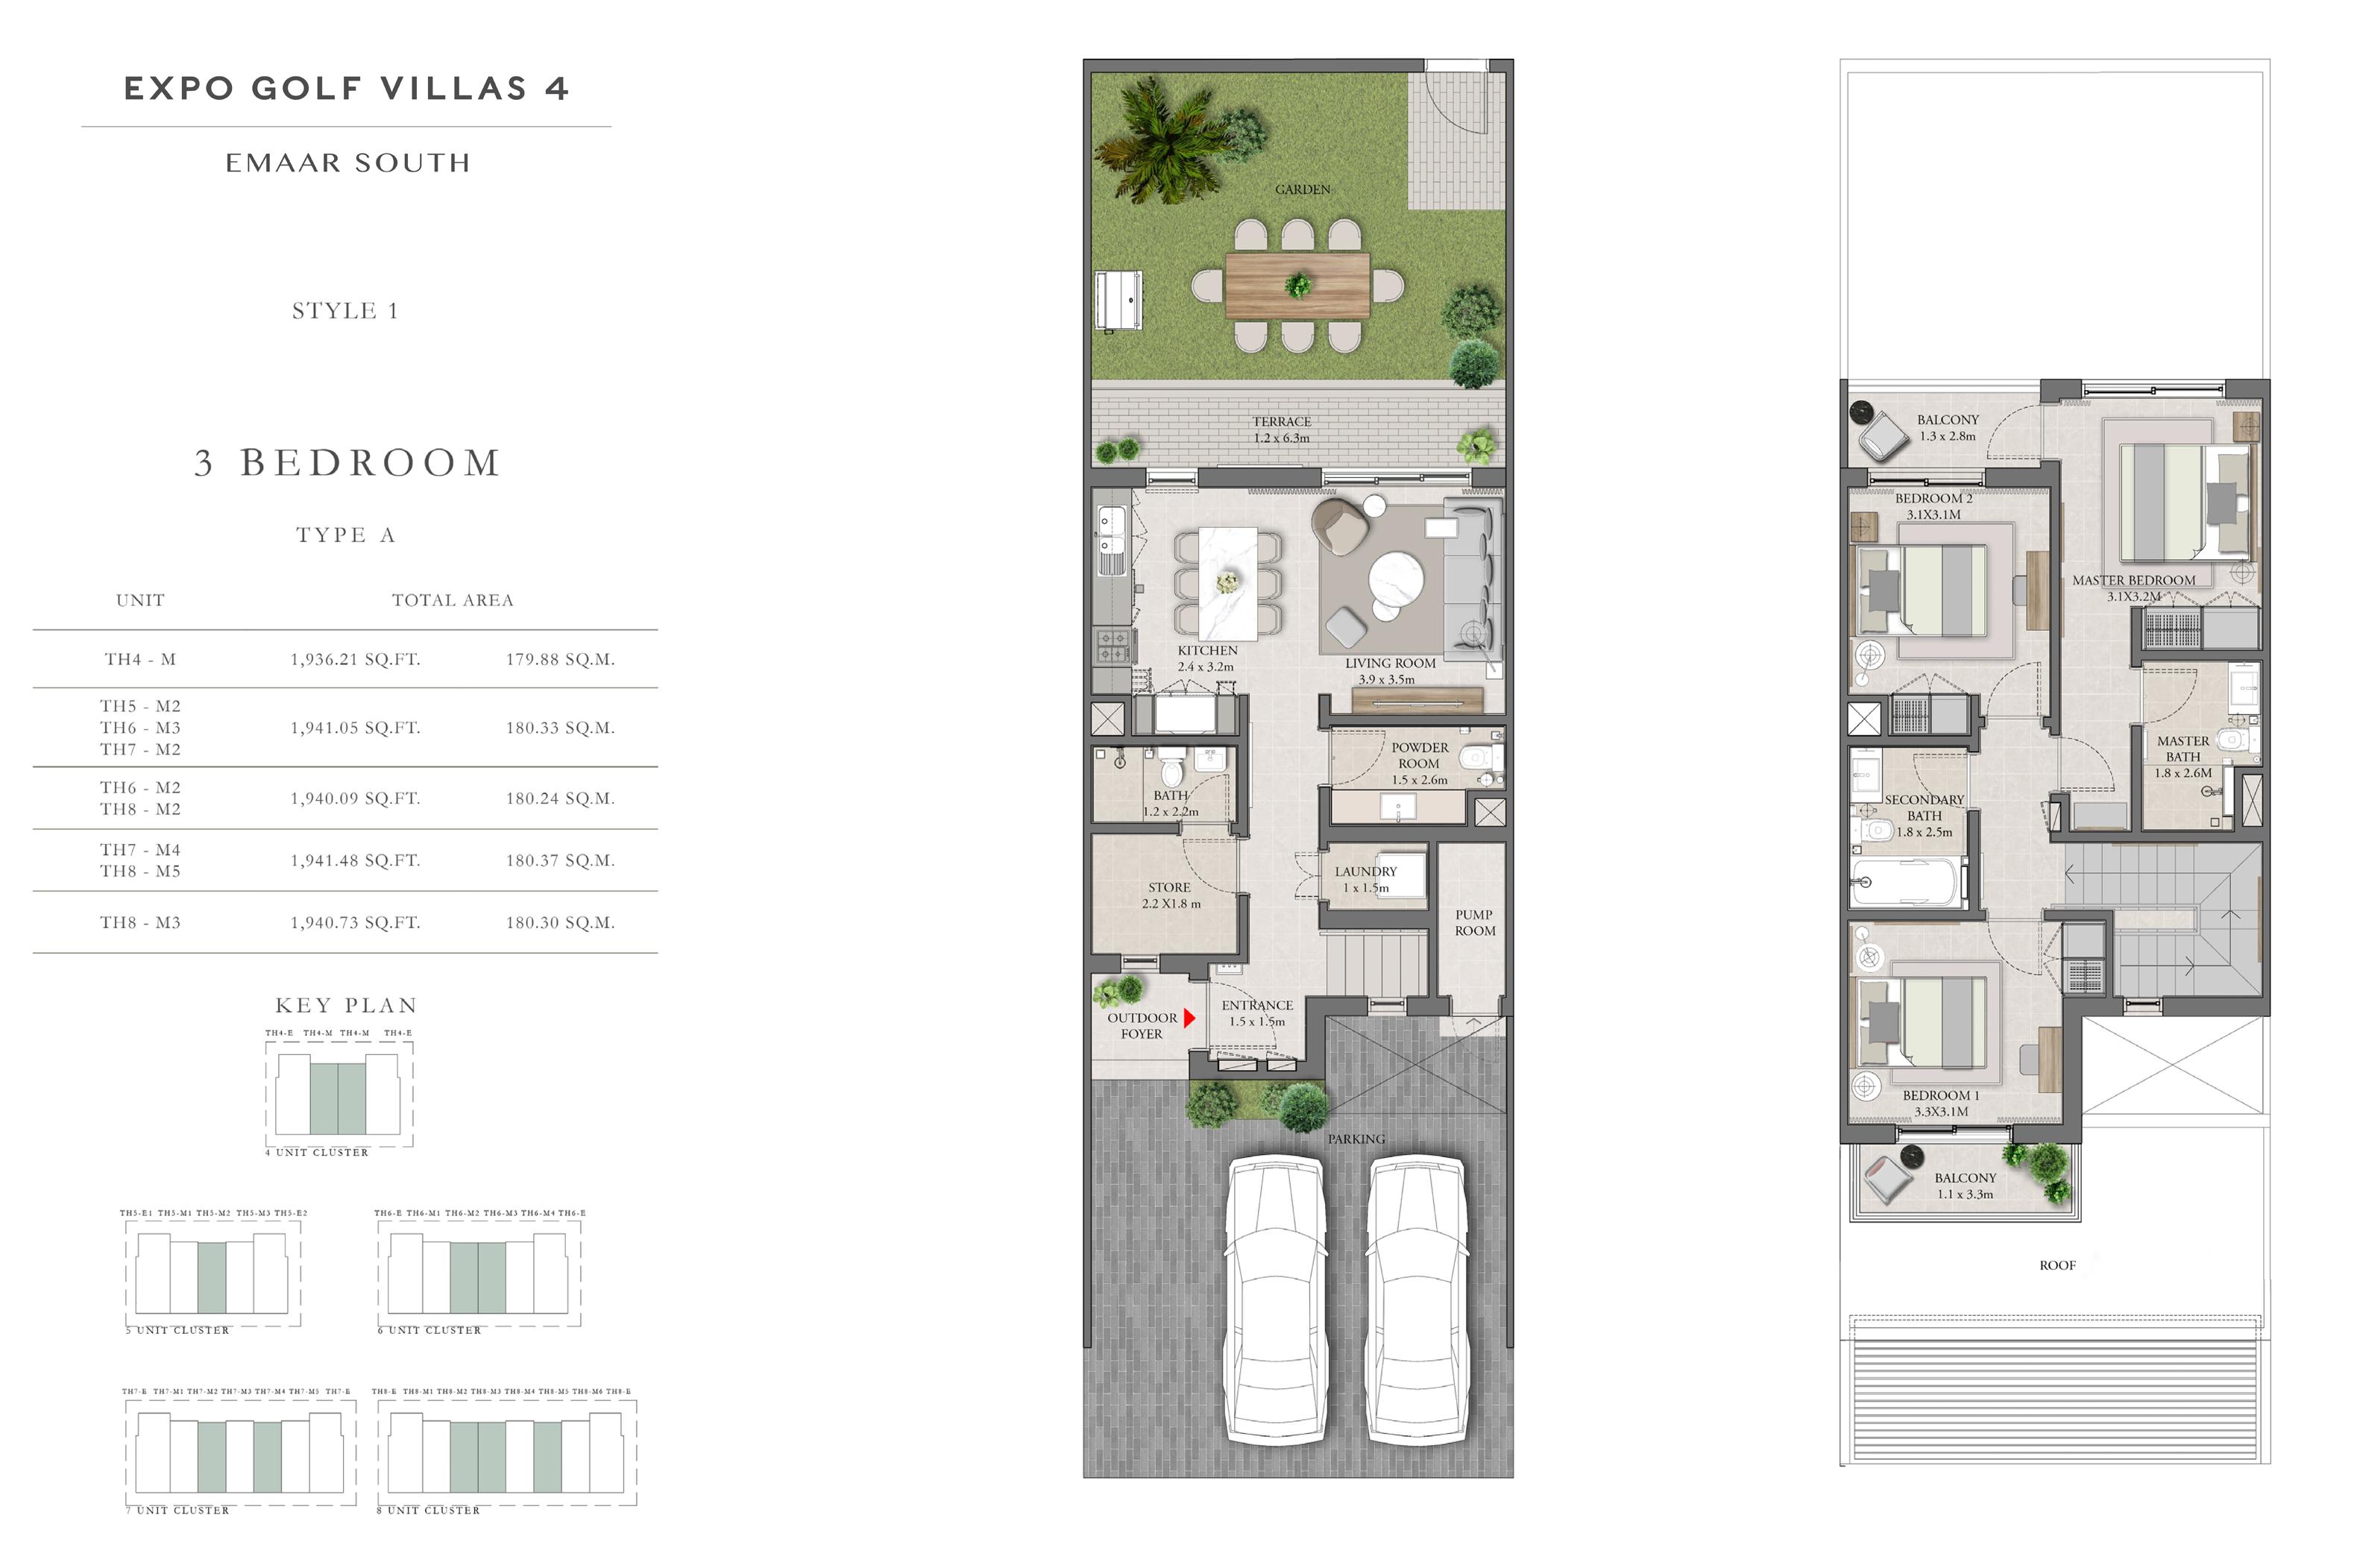 3 غرف نوم، نوع A، حجم 1940 قدم مربع